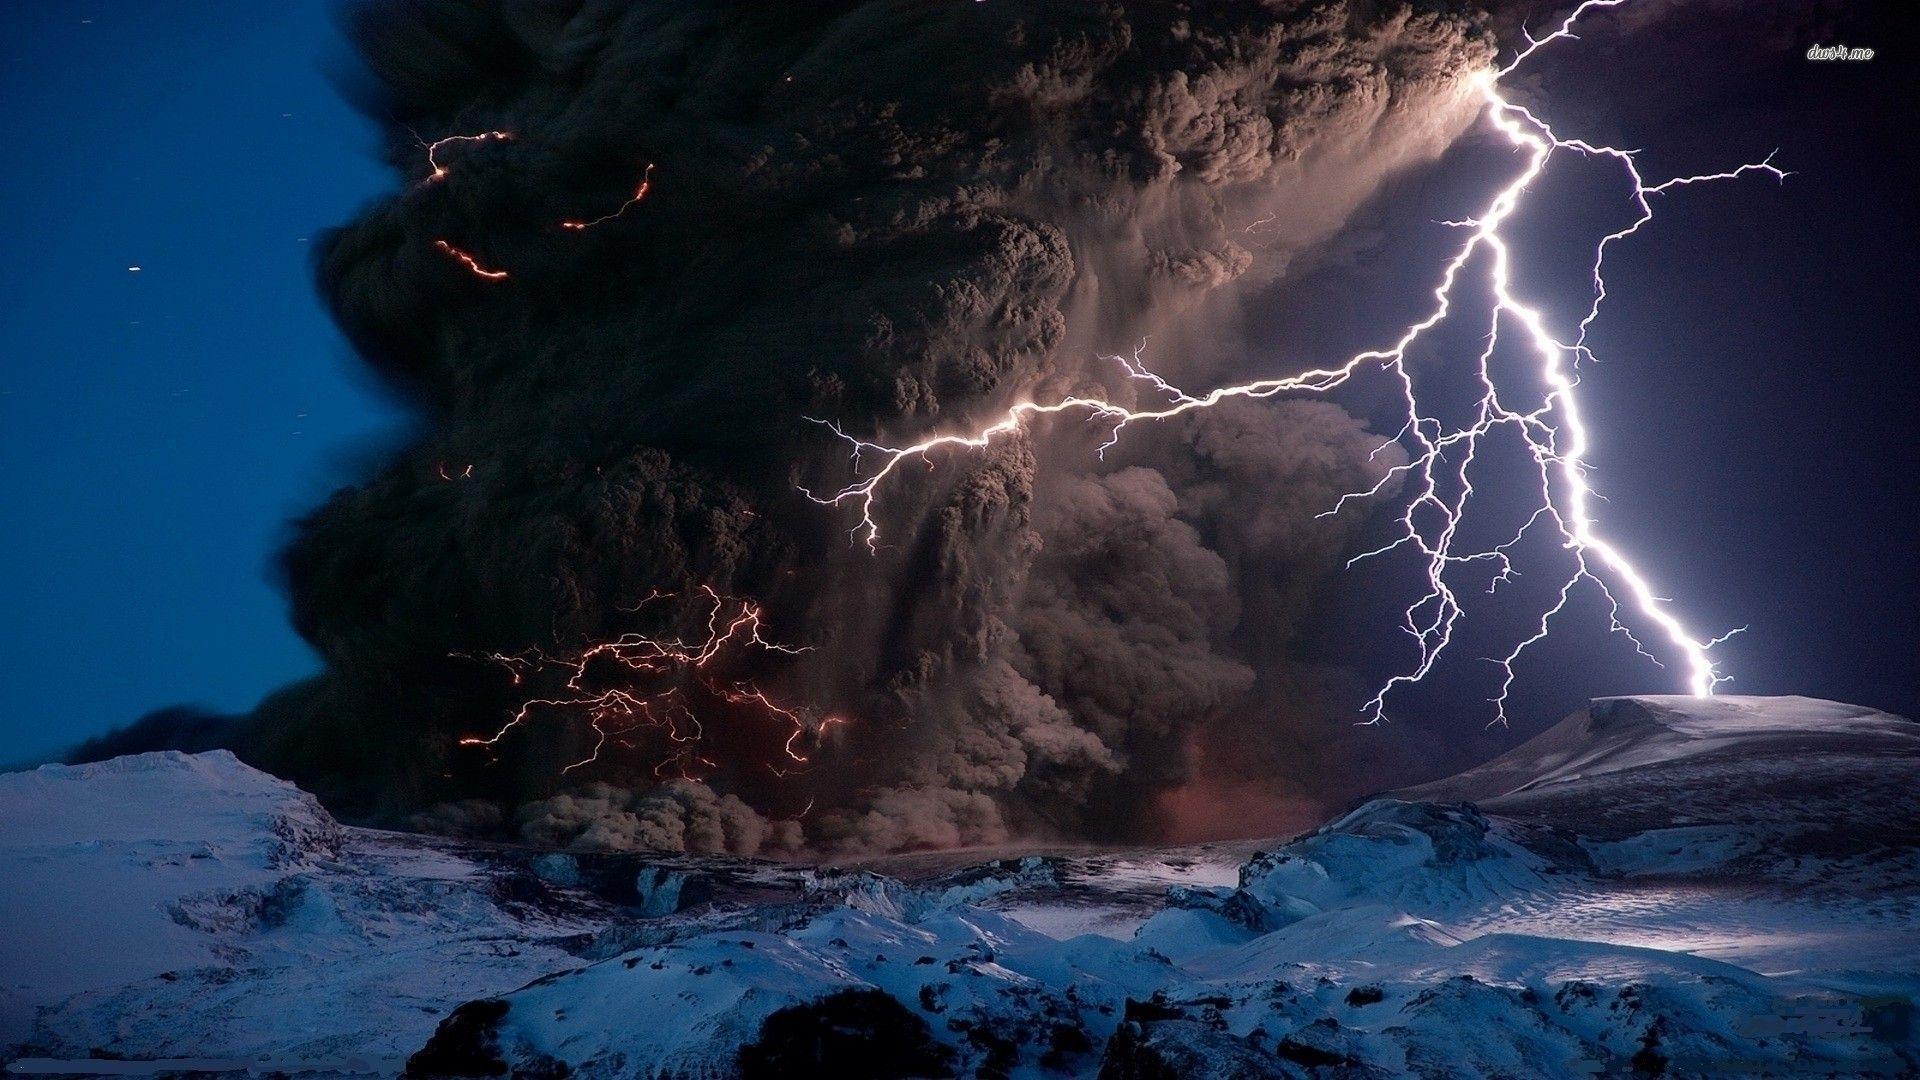 wallpaper hd volcano eruption - photo #20